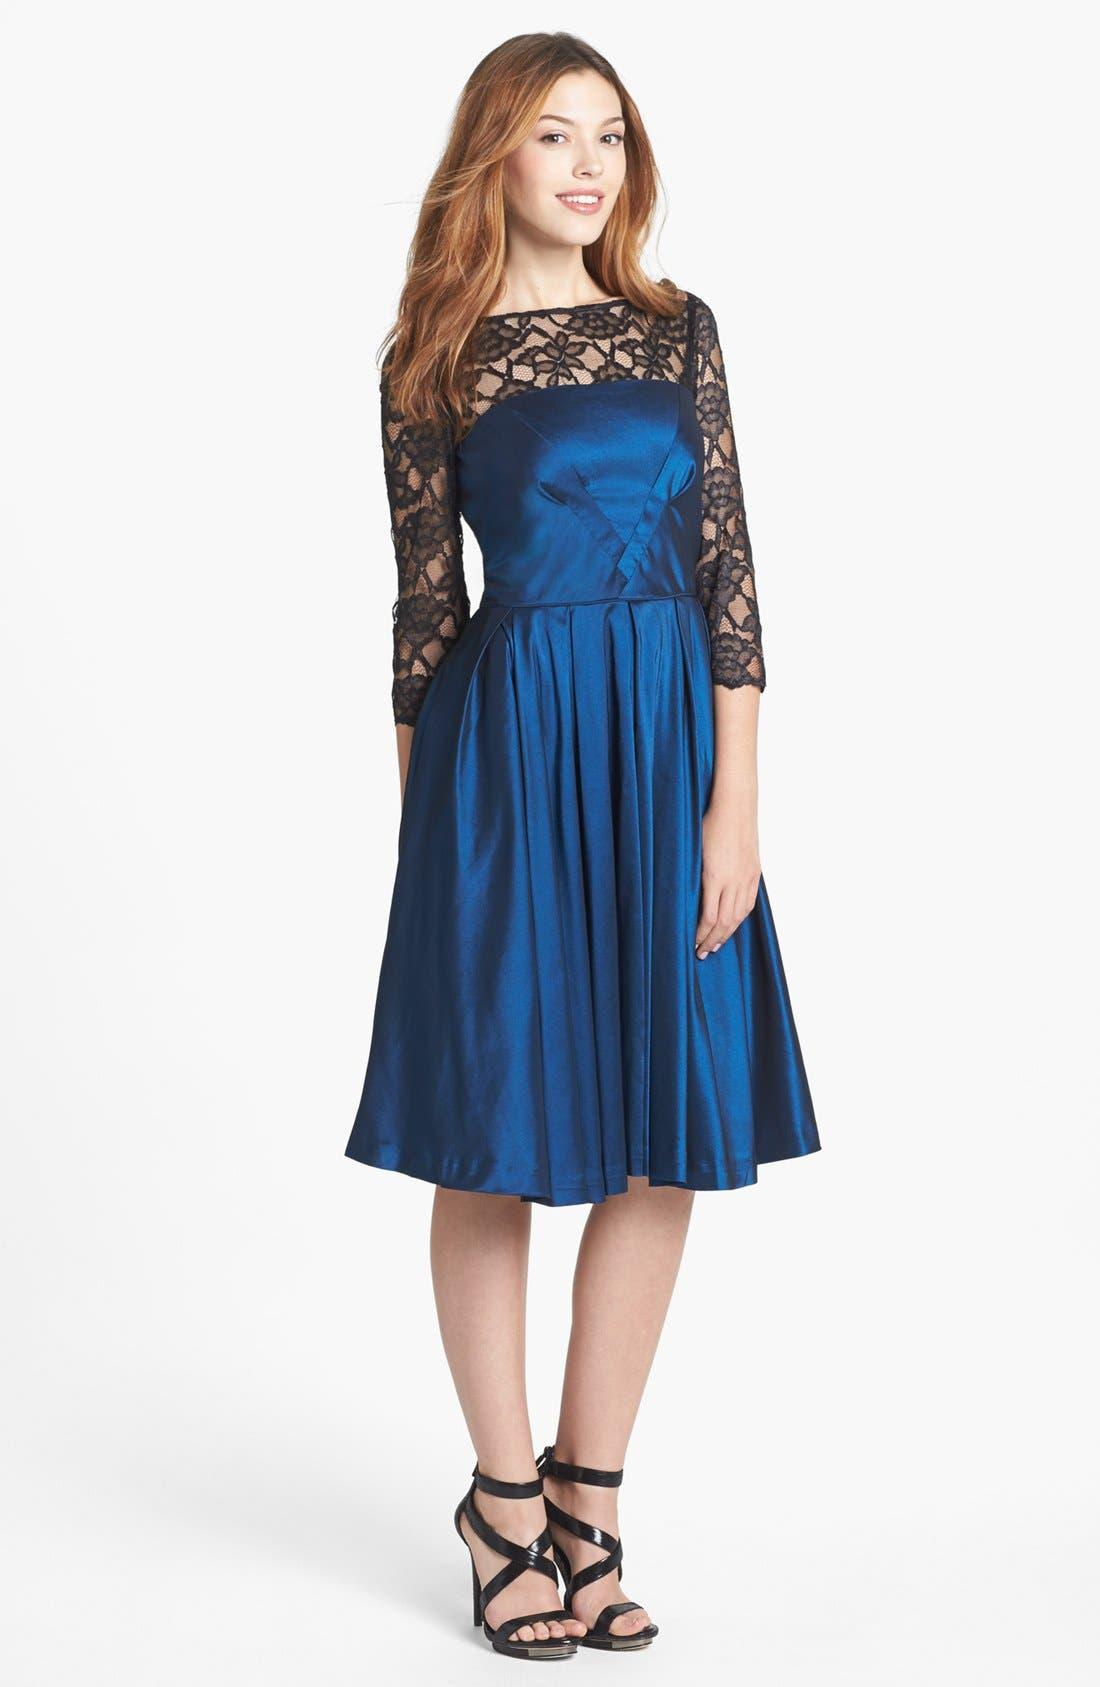 Alternate Image 1 Selected - Maggy London Lace Yoke Taffeta Fit & Flare Dress